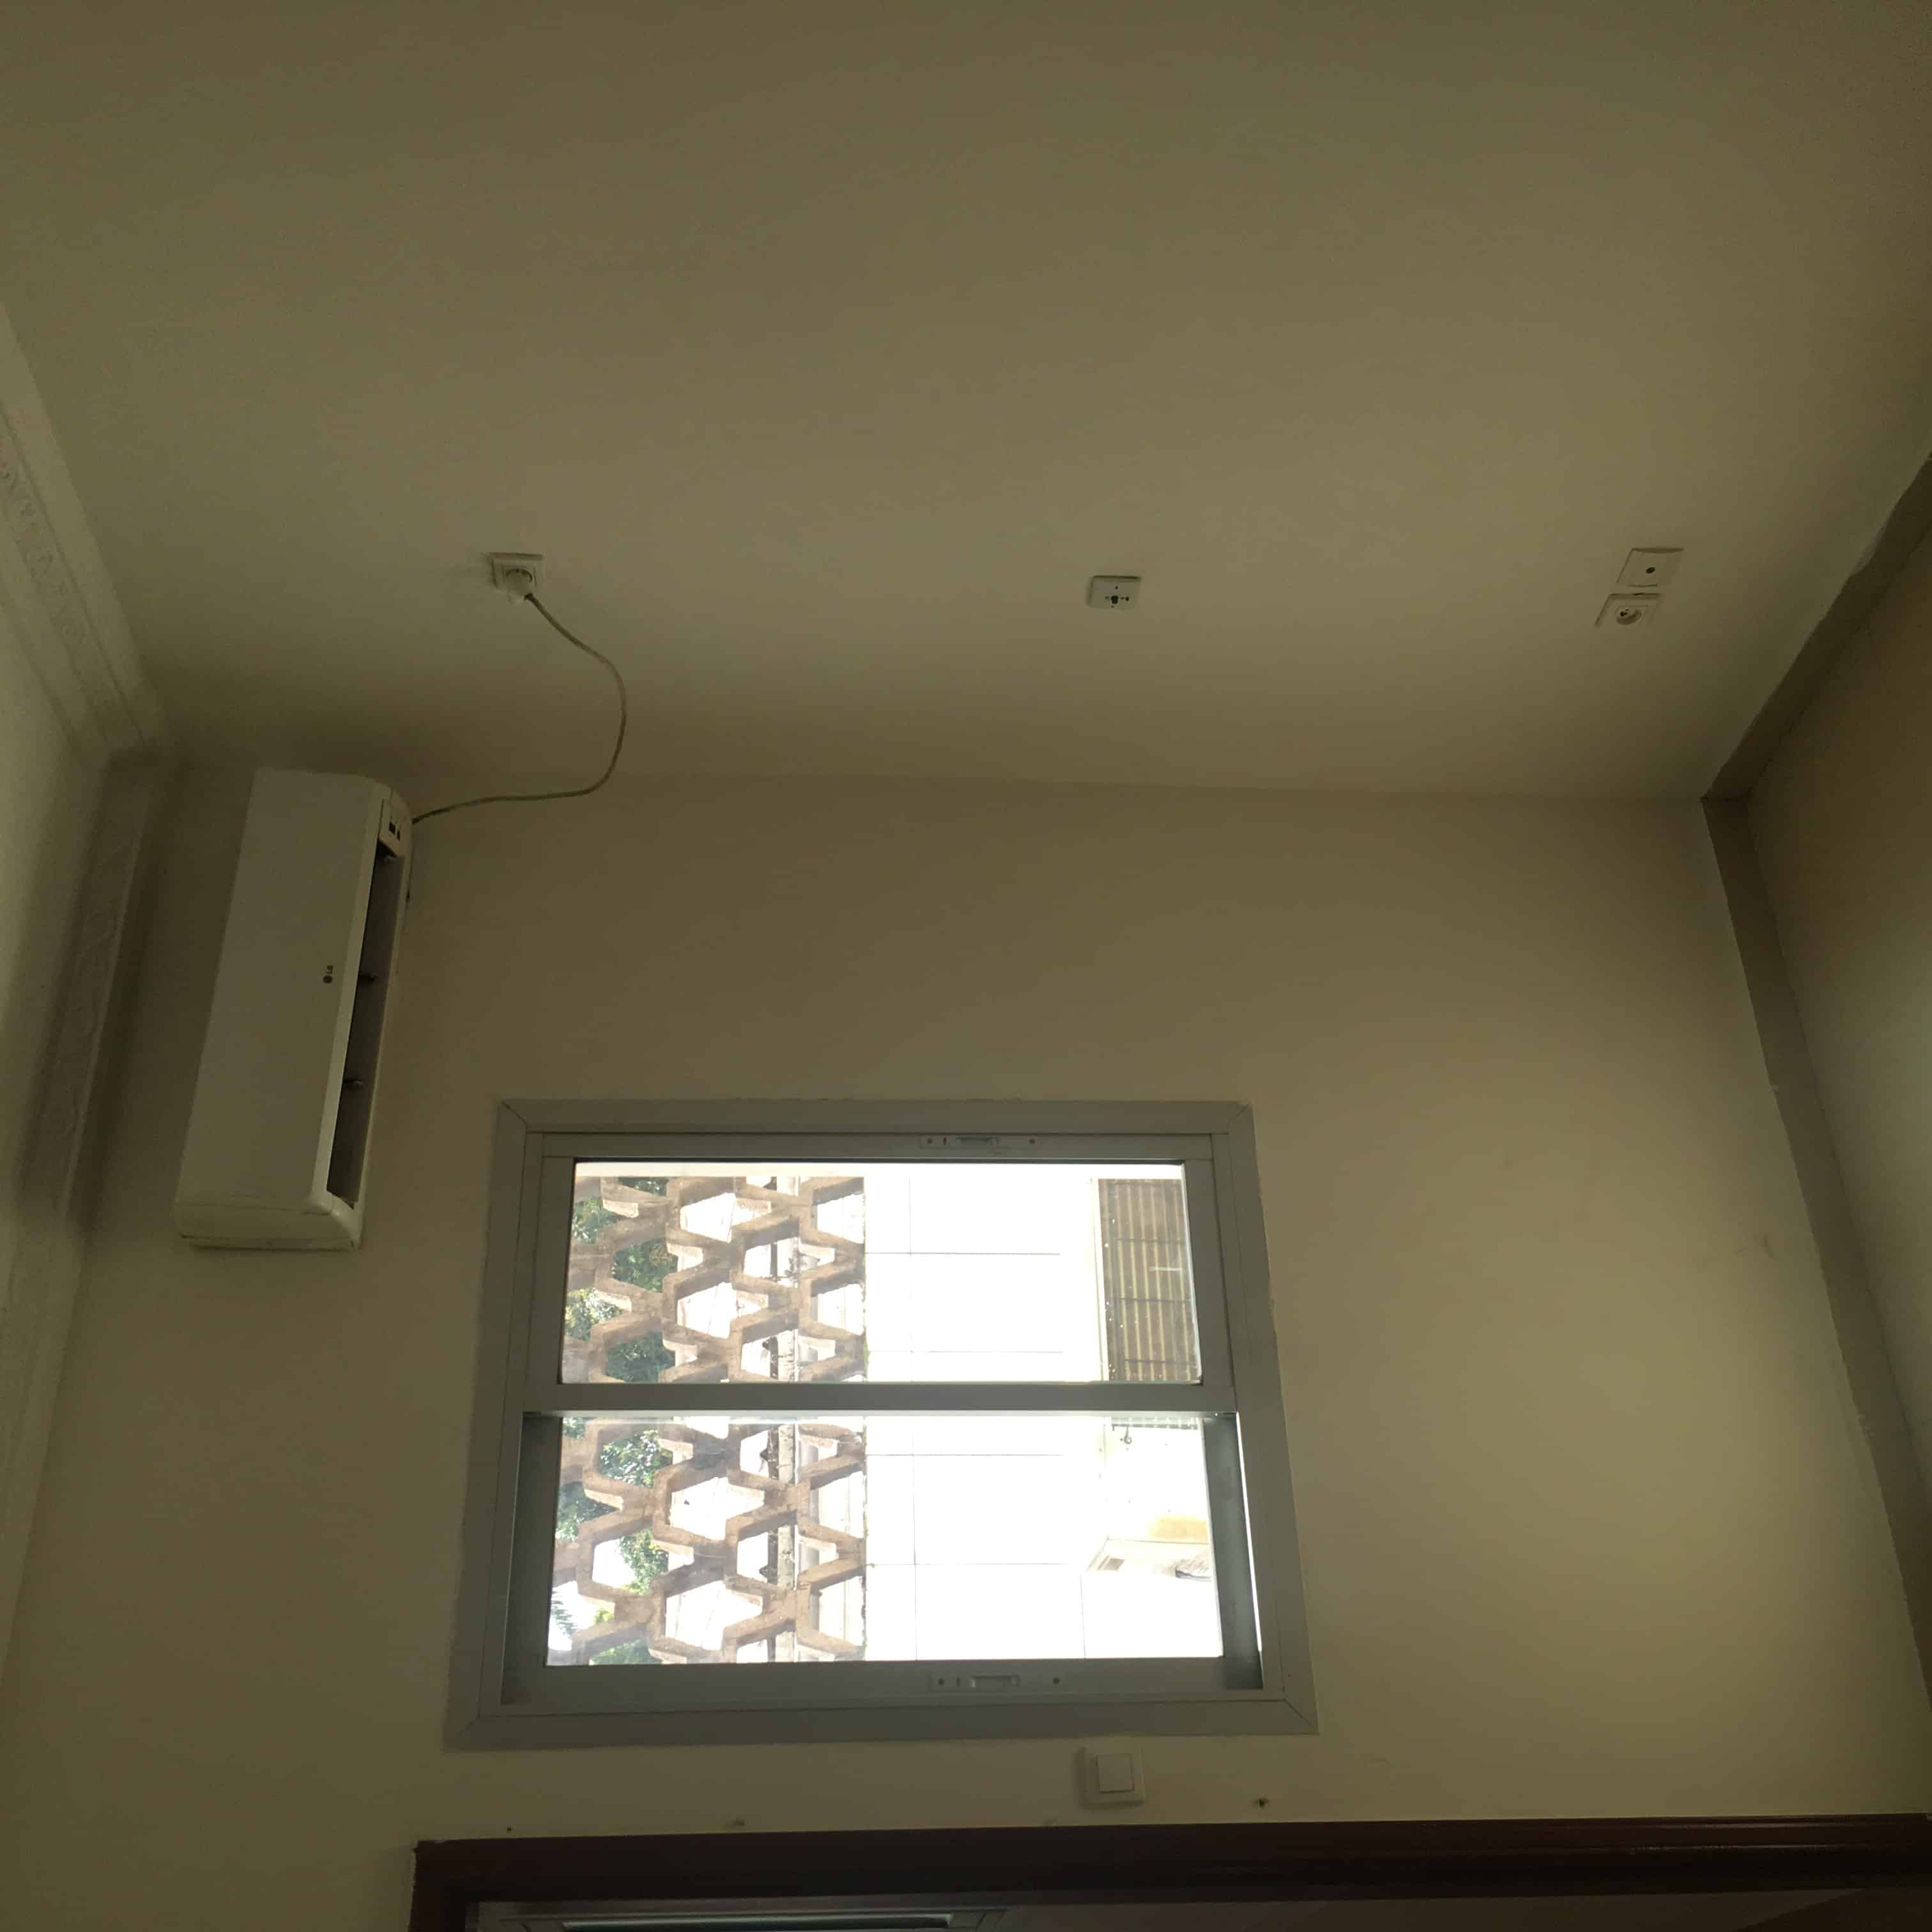 Apartment to rent - Yaoundé, Bastos, Carrefour - 1 living room(s), 1 bedroom(s), 1 bathroom(s) - 350 000 FCFA / month